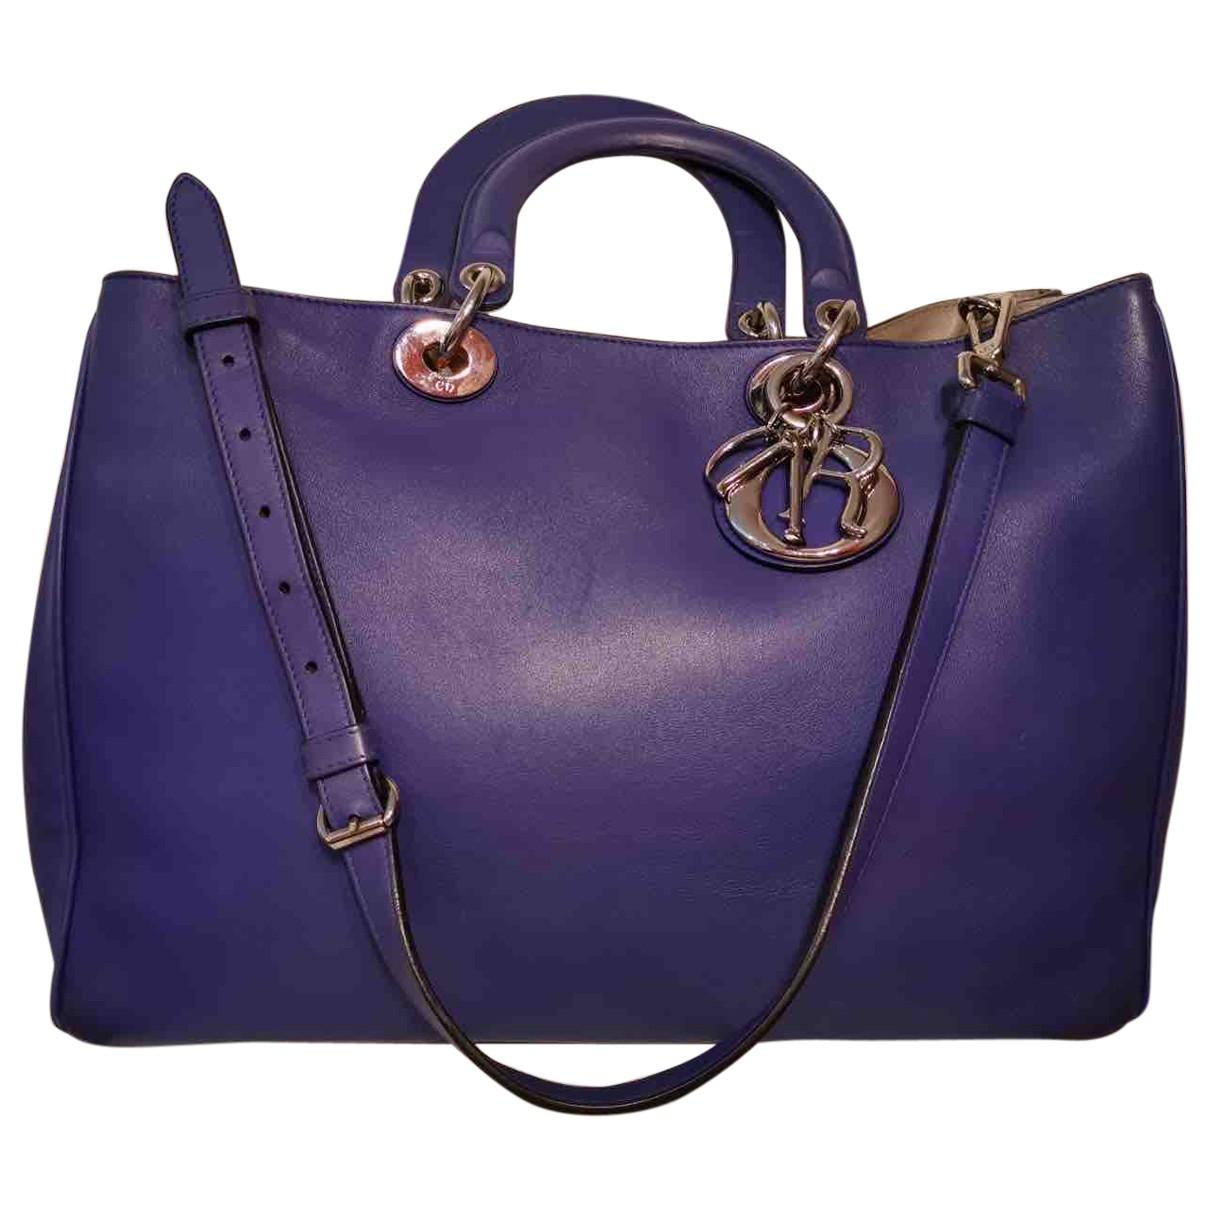 Dior Diorissimo Handtasche in  Lila Leder